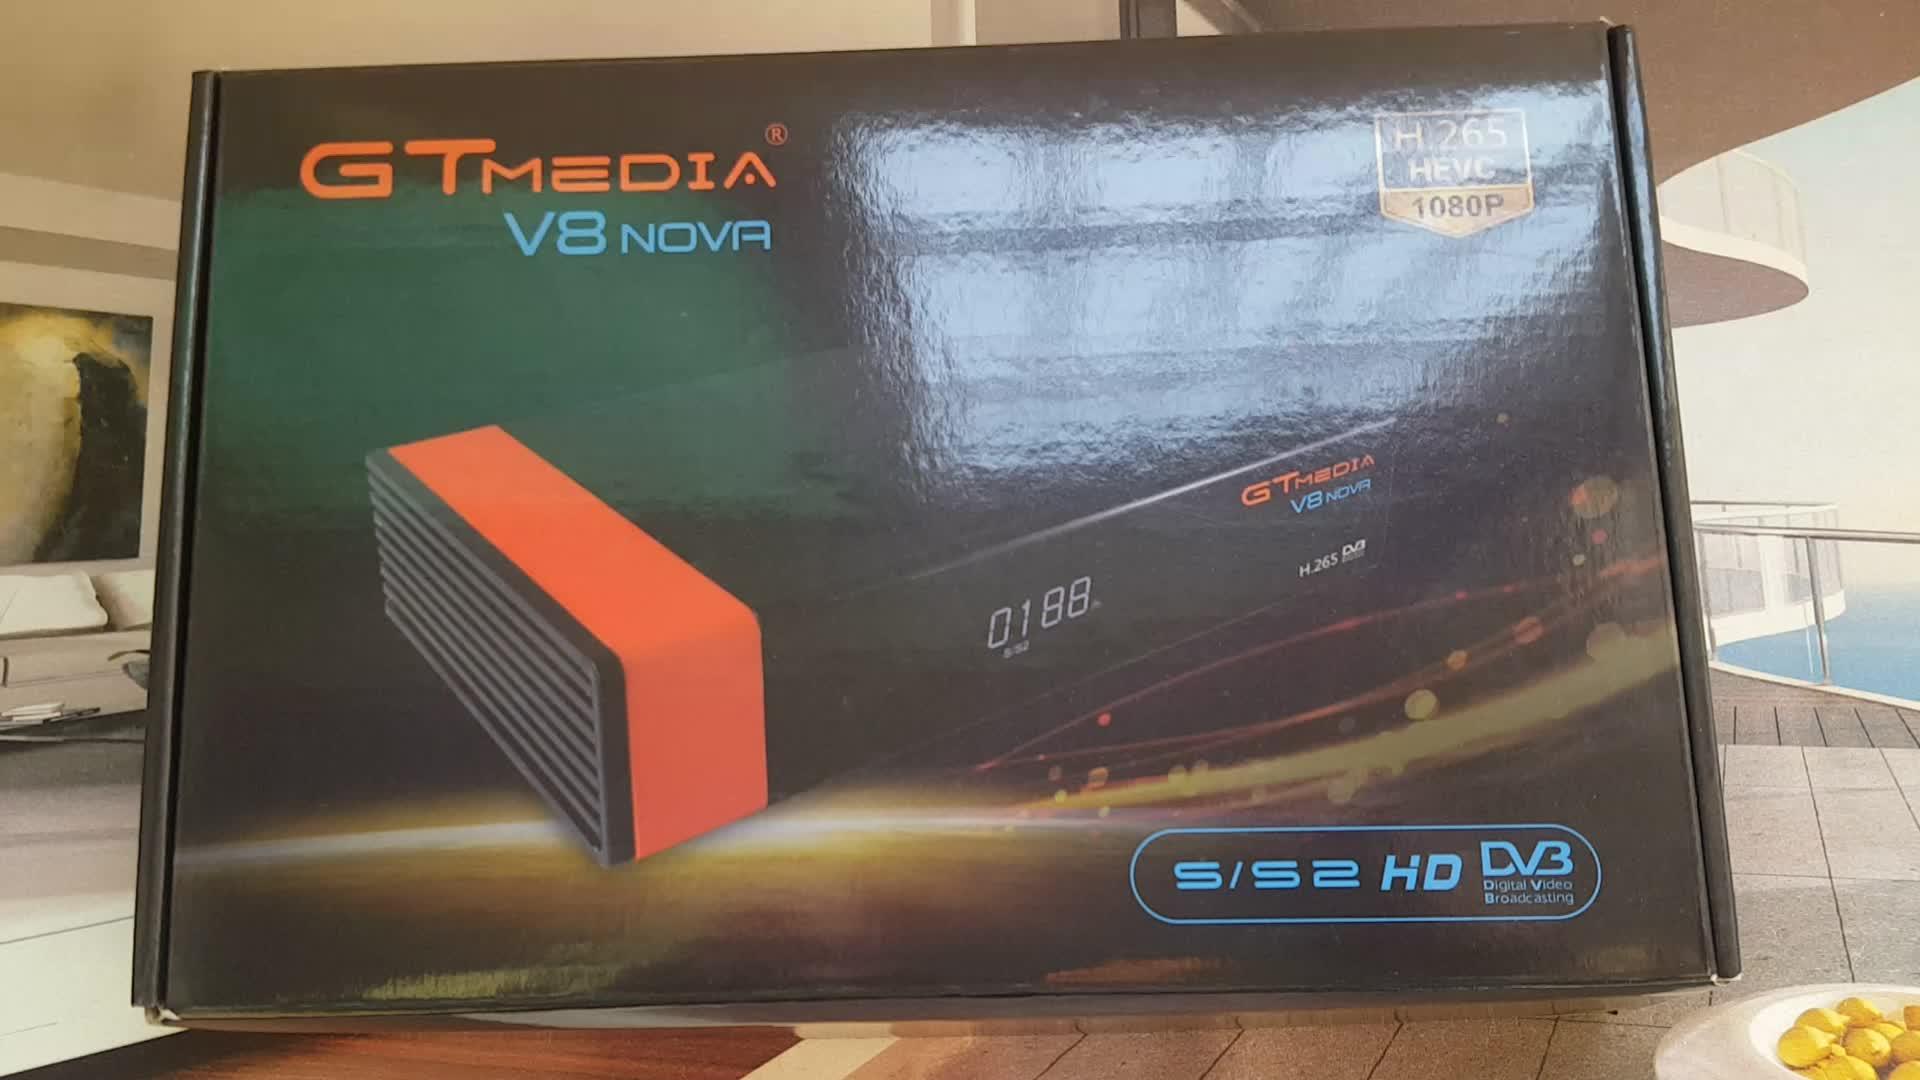 Original GTMEDIA V8 Nova H.265 Satellite Receiver DVB-S2 Free to Air Full HD digital TV Box Support PowerVu freesat V8 super GTM